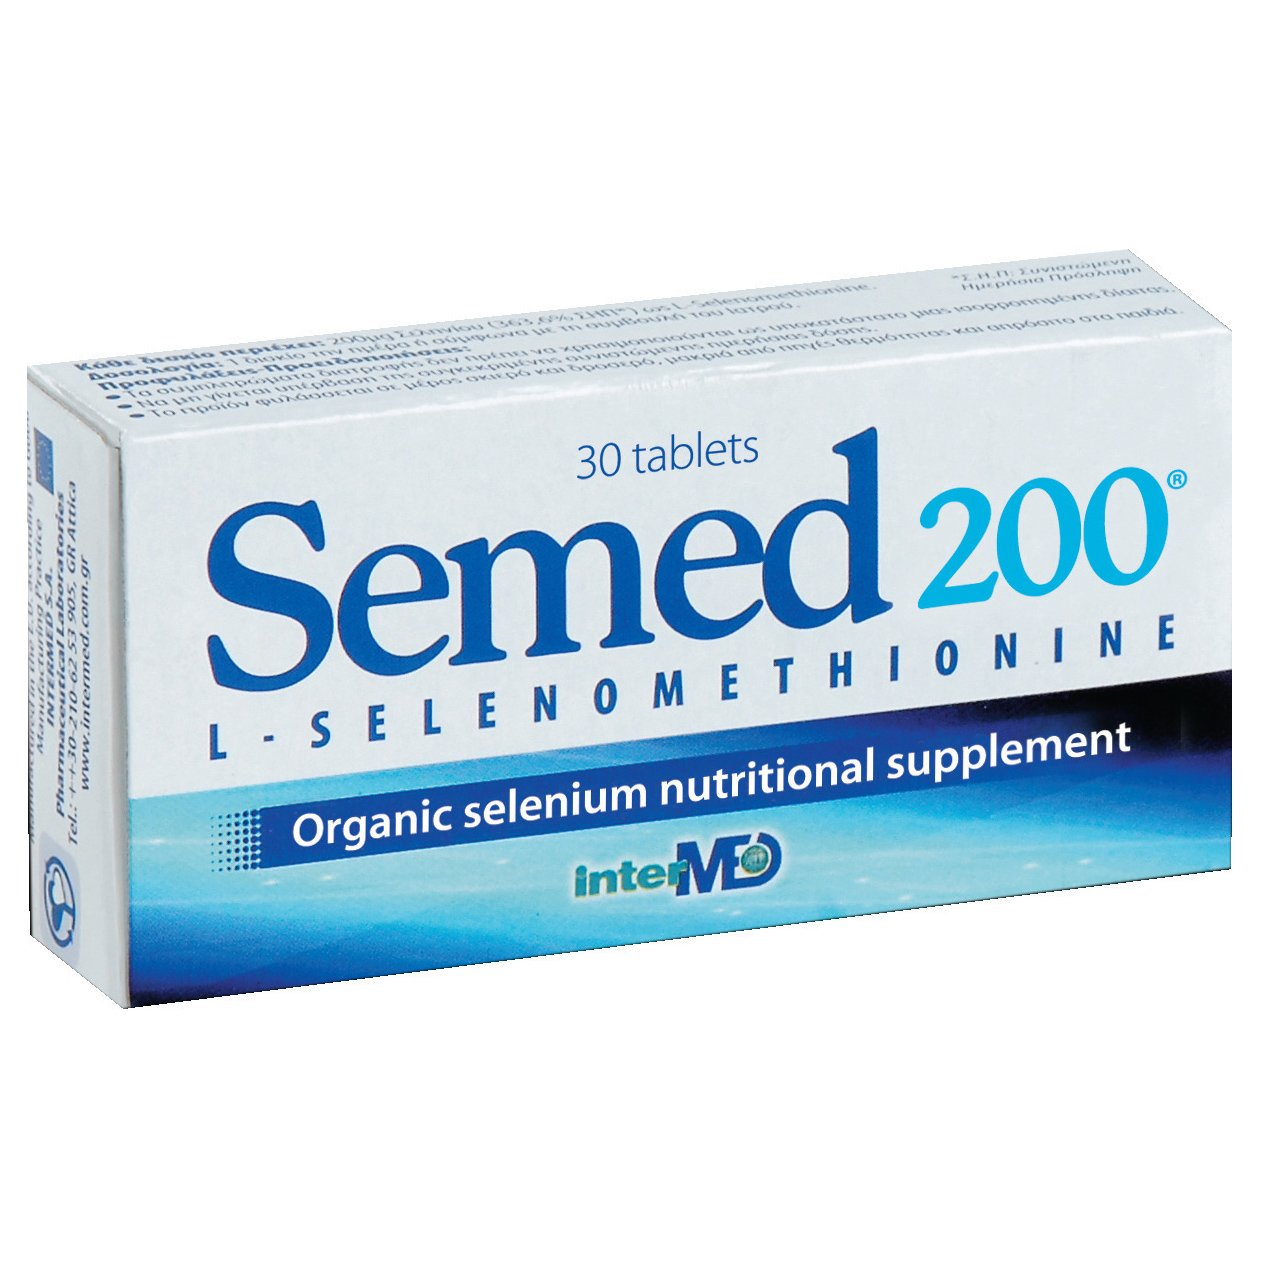 Intermed Semed 200 Αντιοξειδωτικό Συμπλήρωμα Οργανικού Σεληνίου για την Καλή Λειτουργία του Θυρεοειδούς Αδένα 30Tabs